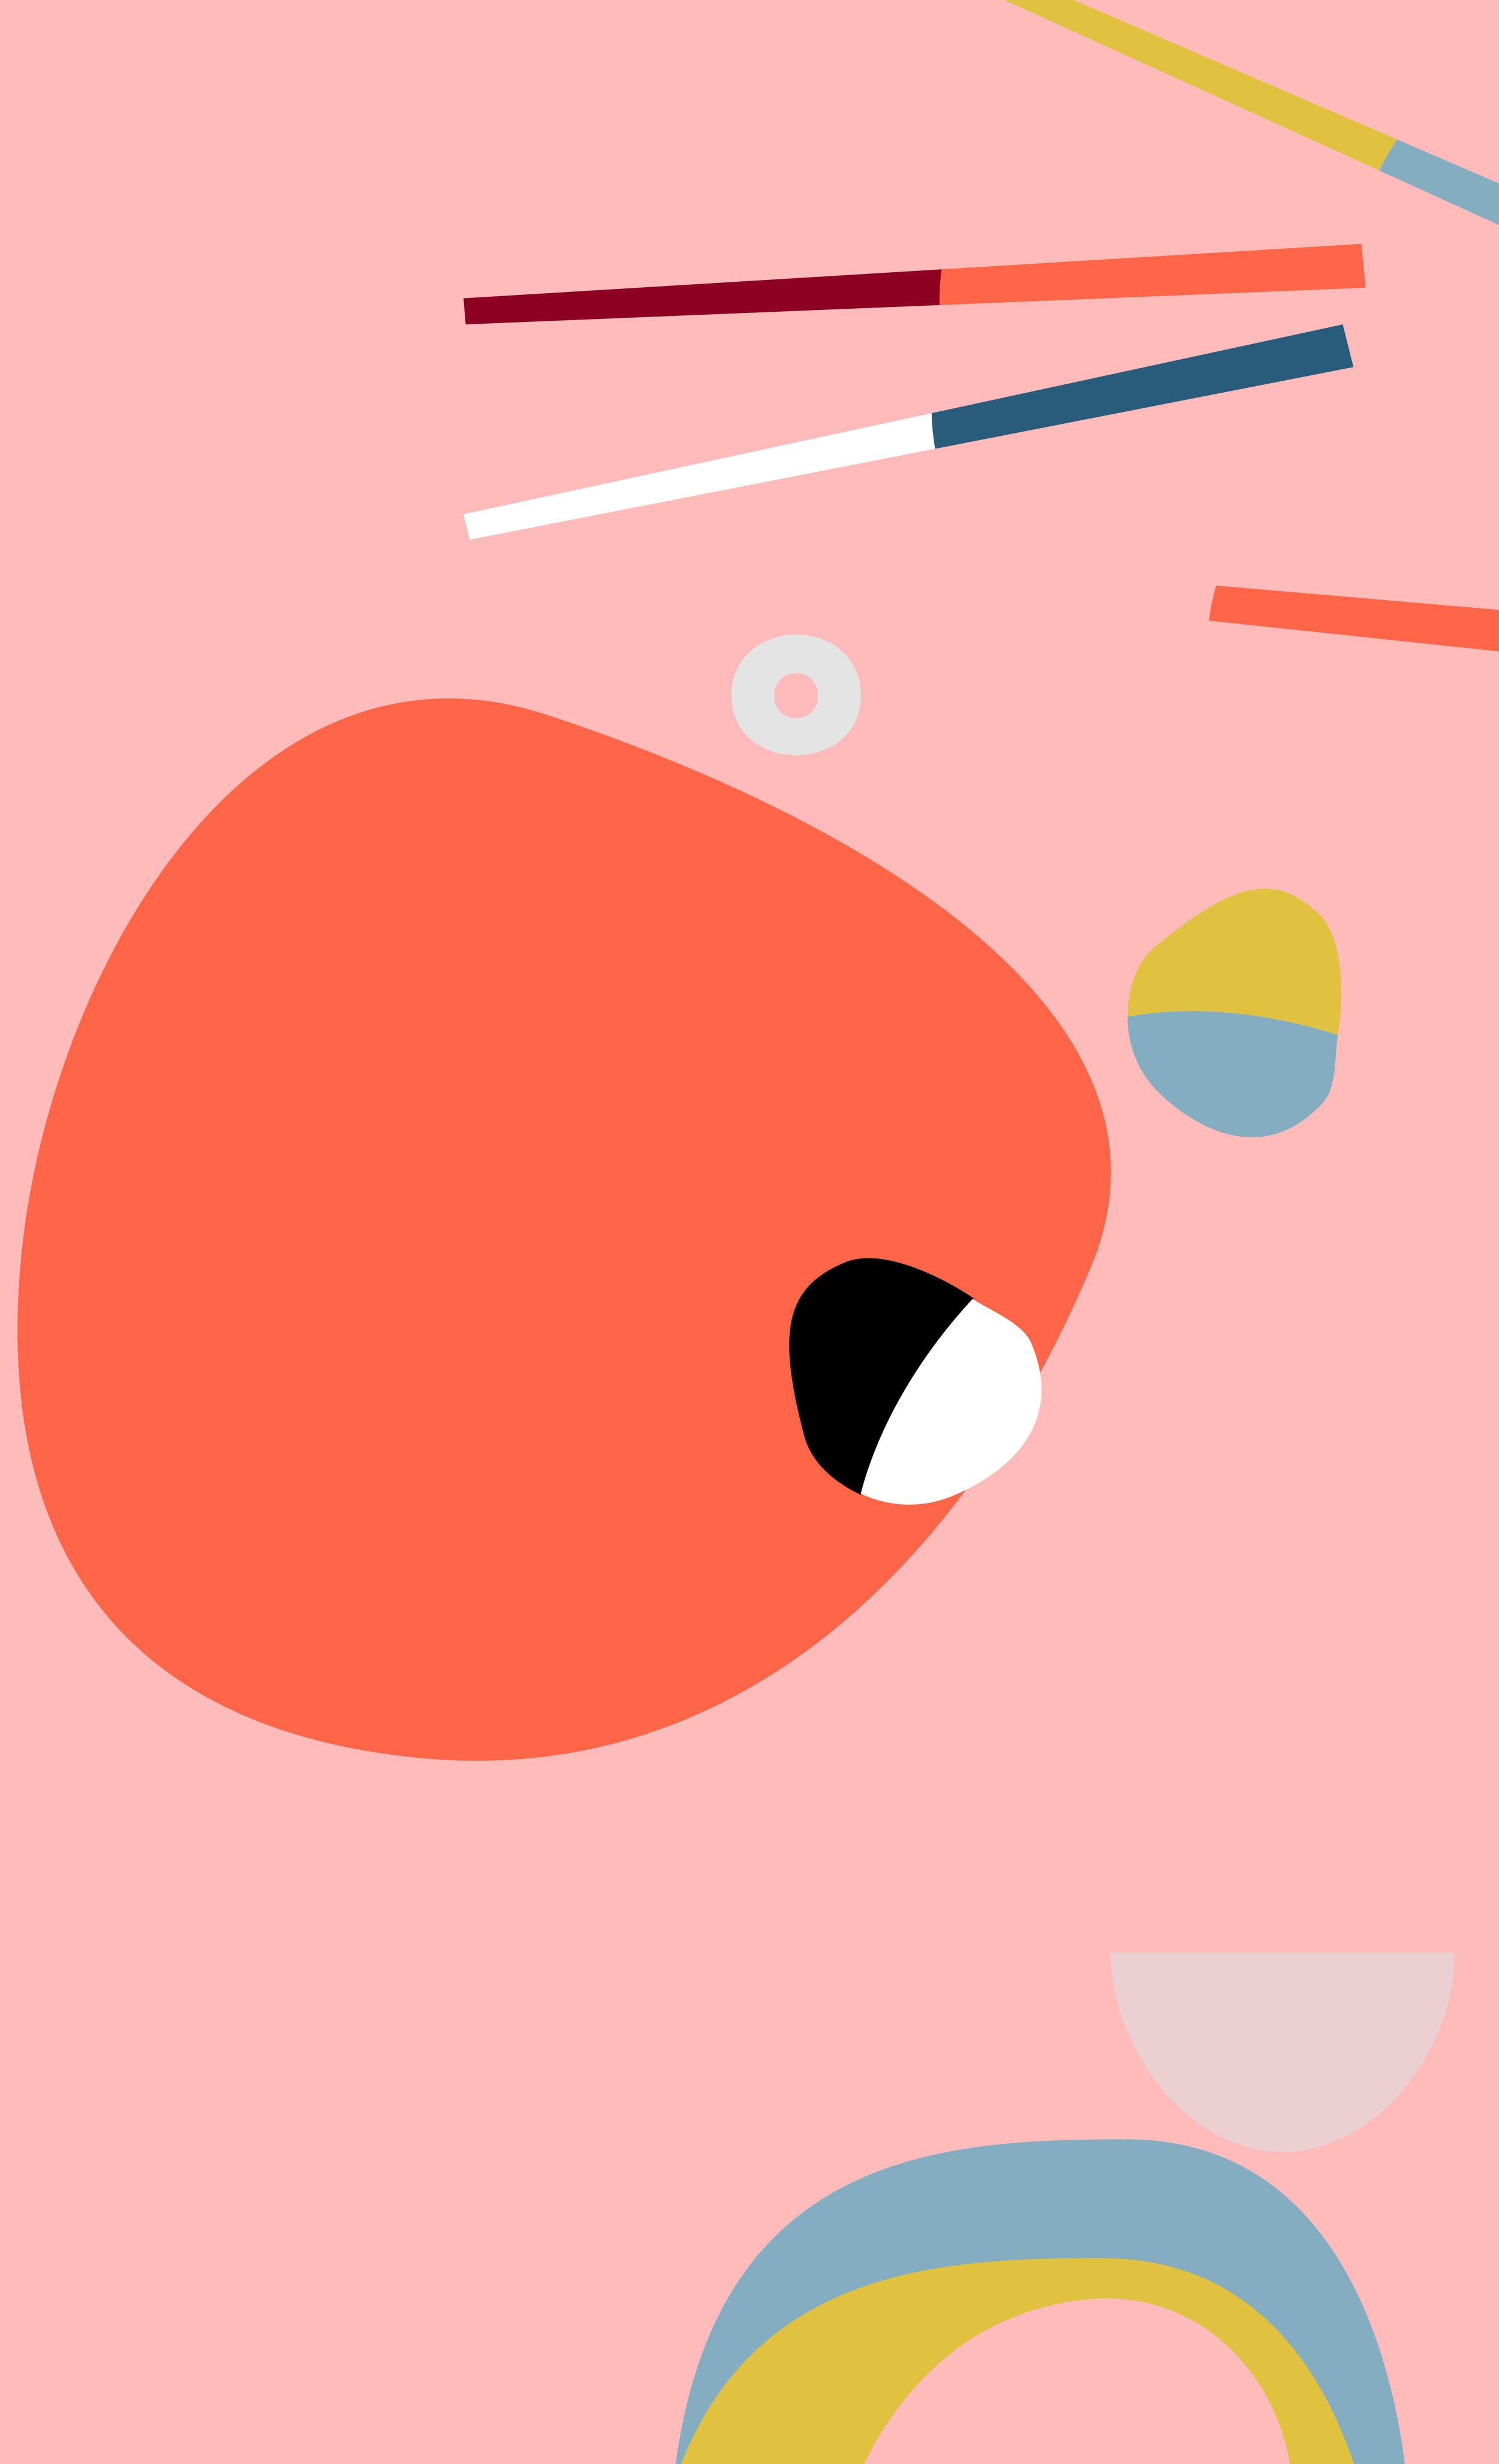 MOTTO_03_pink.jpg